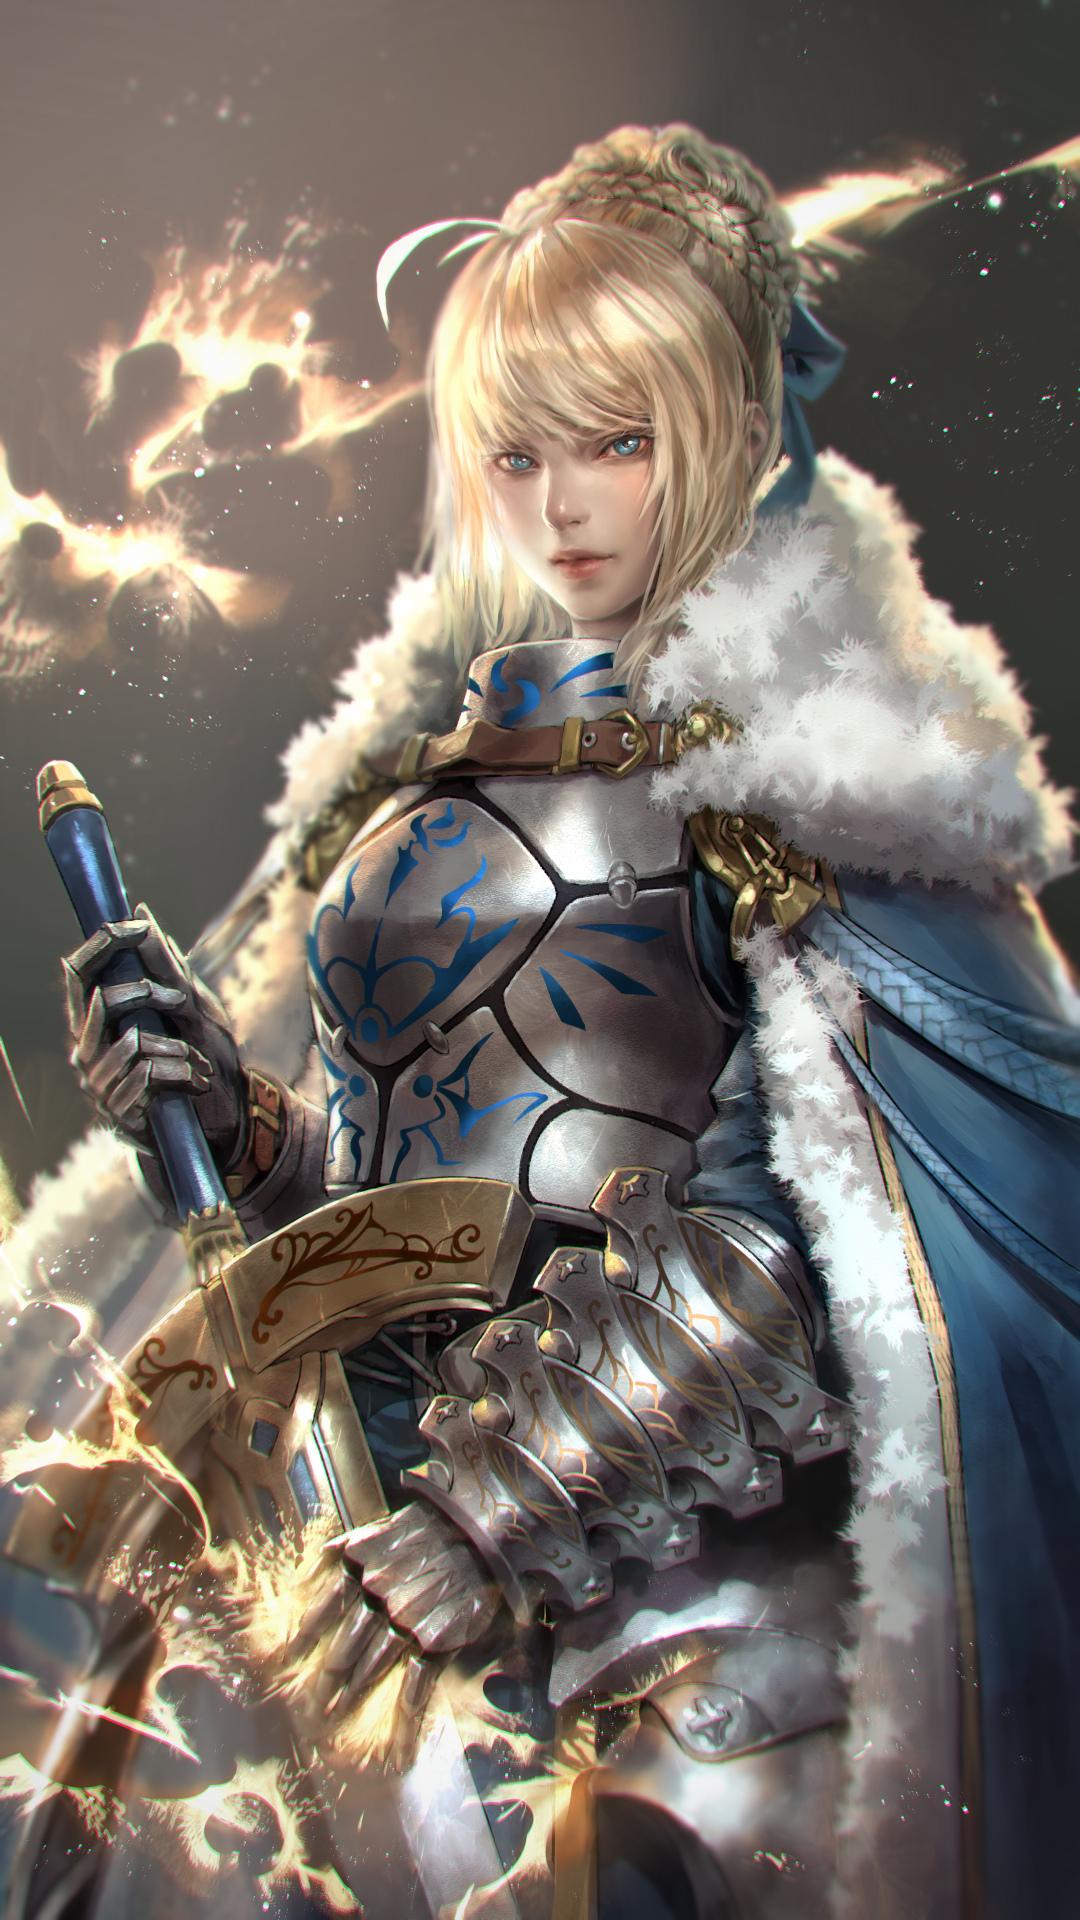 Anime Girl Wallpaper Depth Of Field Wallpaper Fate Series Fate Grand Order Saber Armor